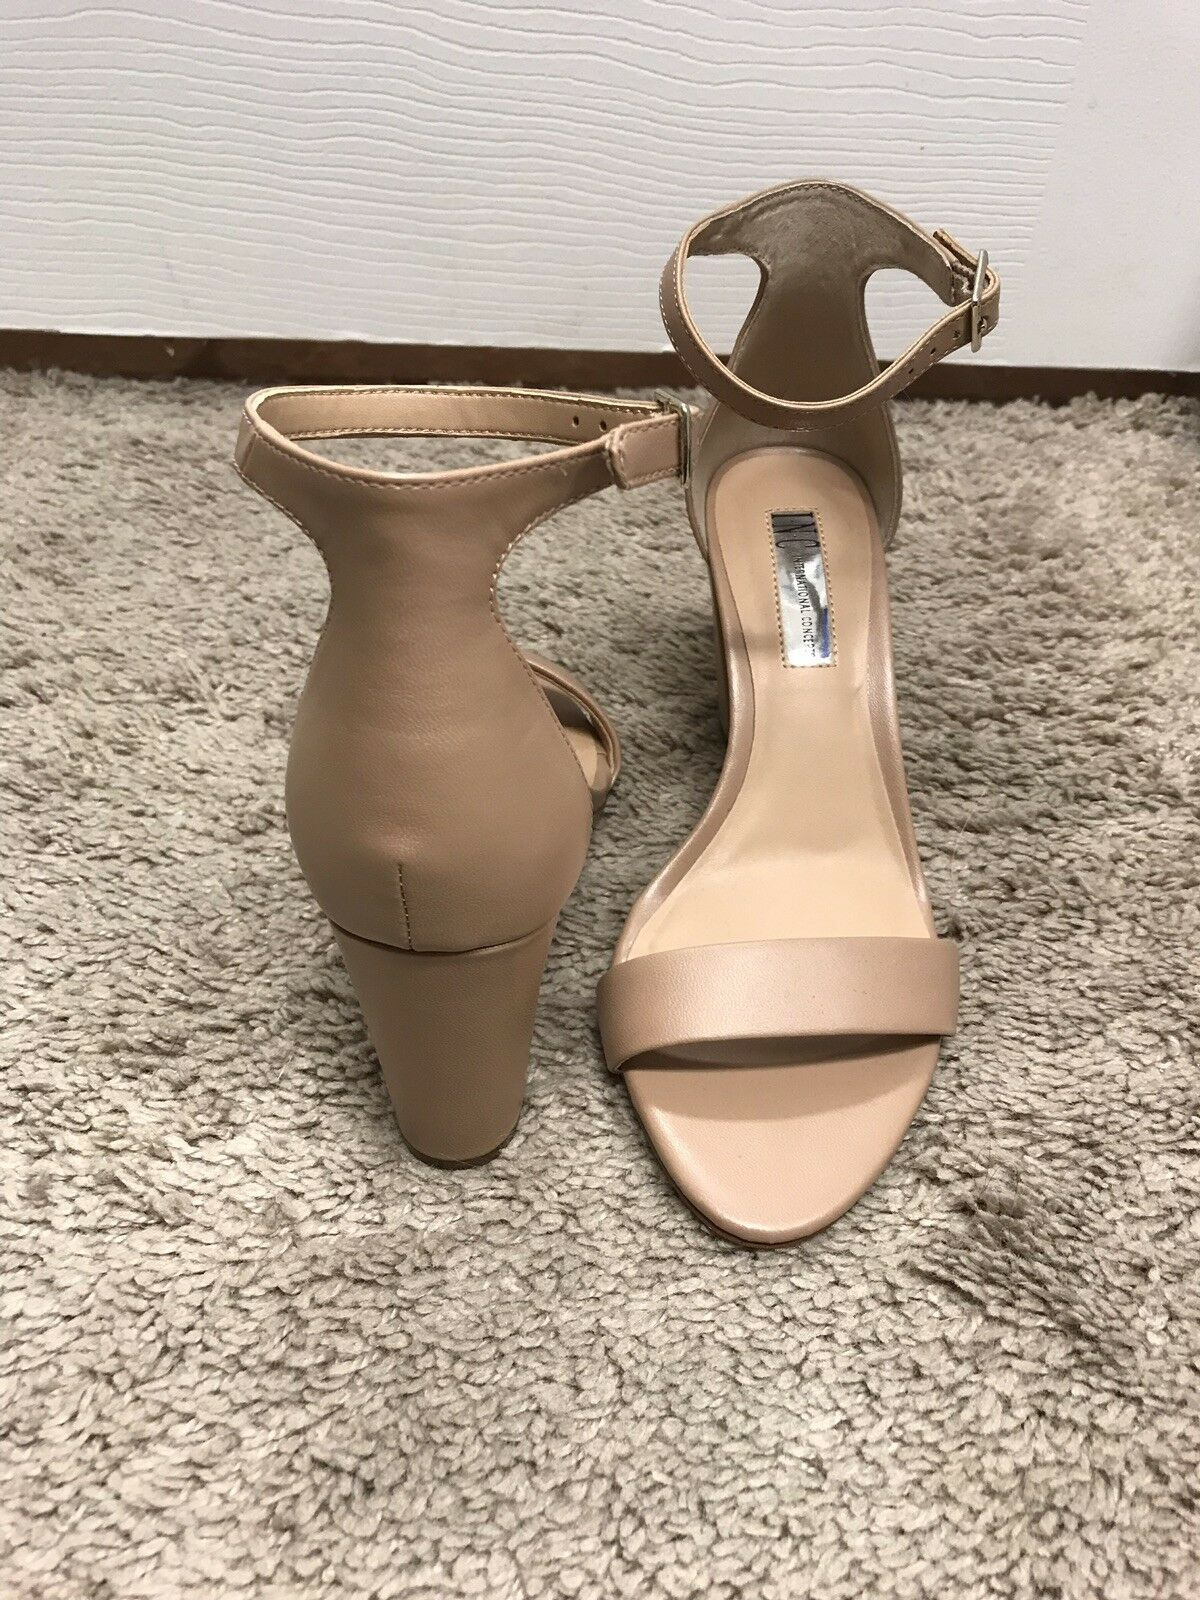 INC International International INC Concepts Kivah Nude damen schuhe 6.5 M Sandals MSRP  89.99 6e5513